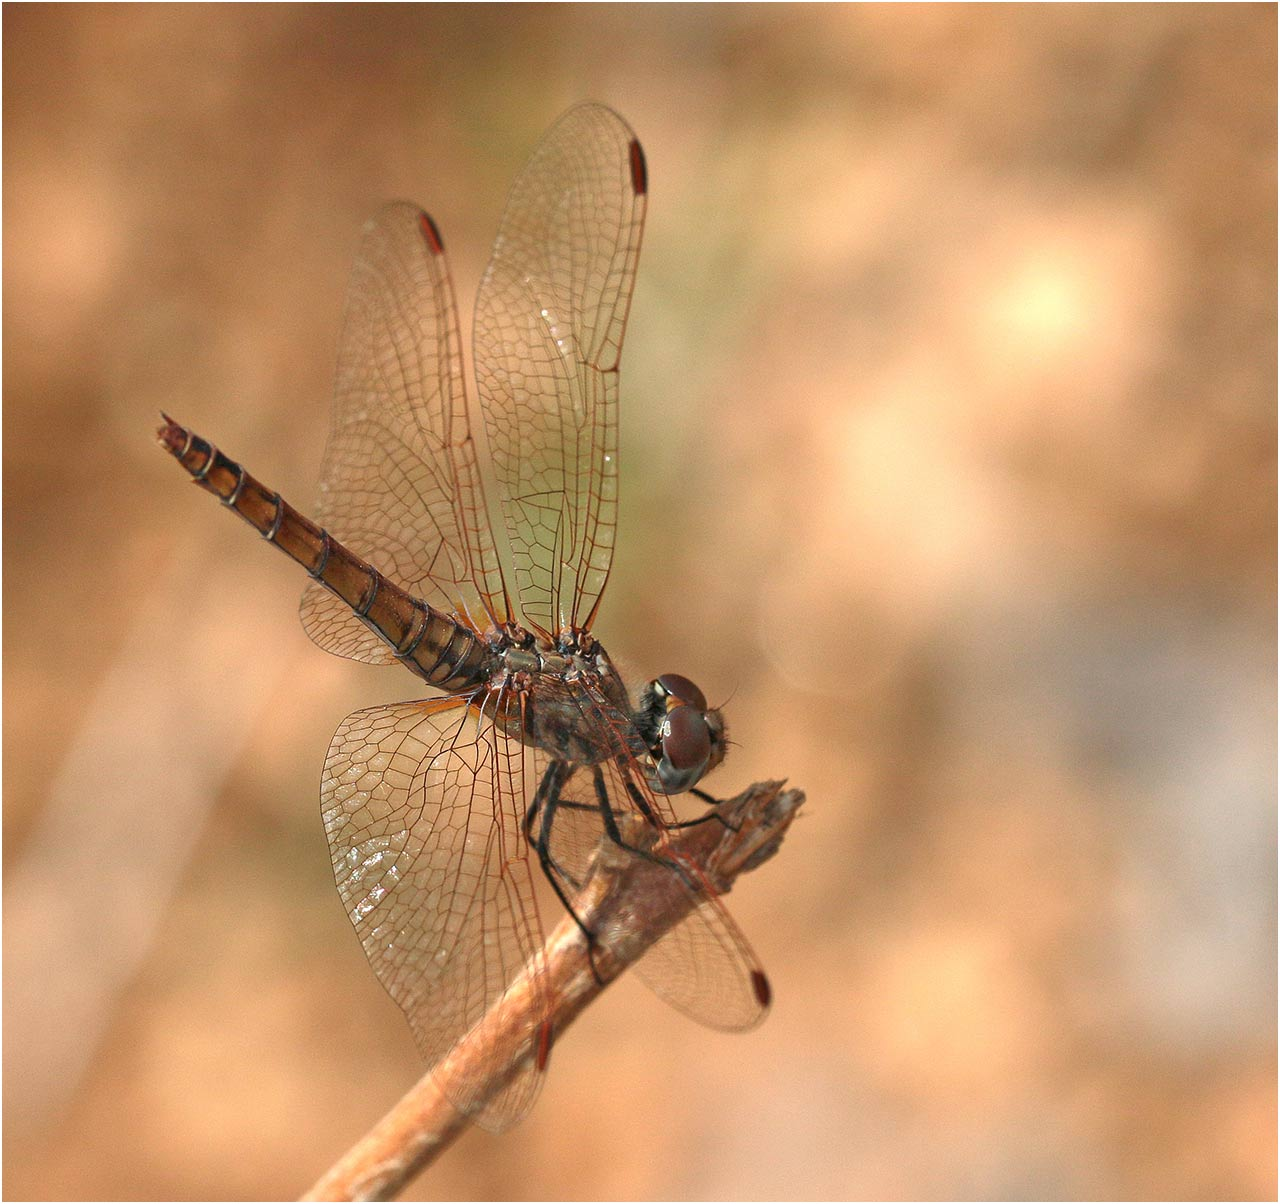 Trithemis annulata femelle, Ethiopie, Weito River, 25/10/2018